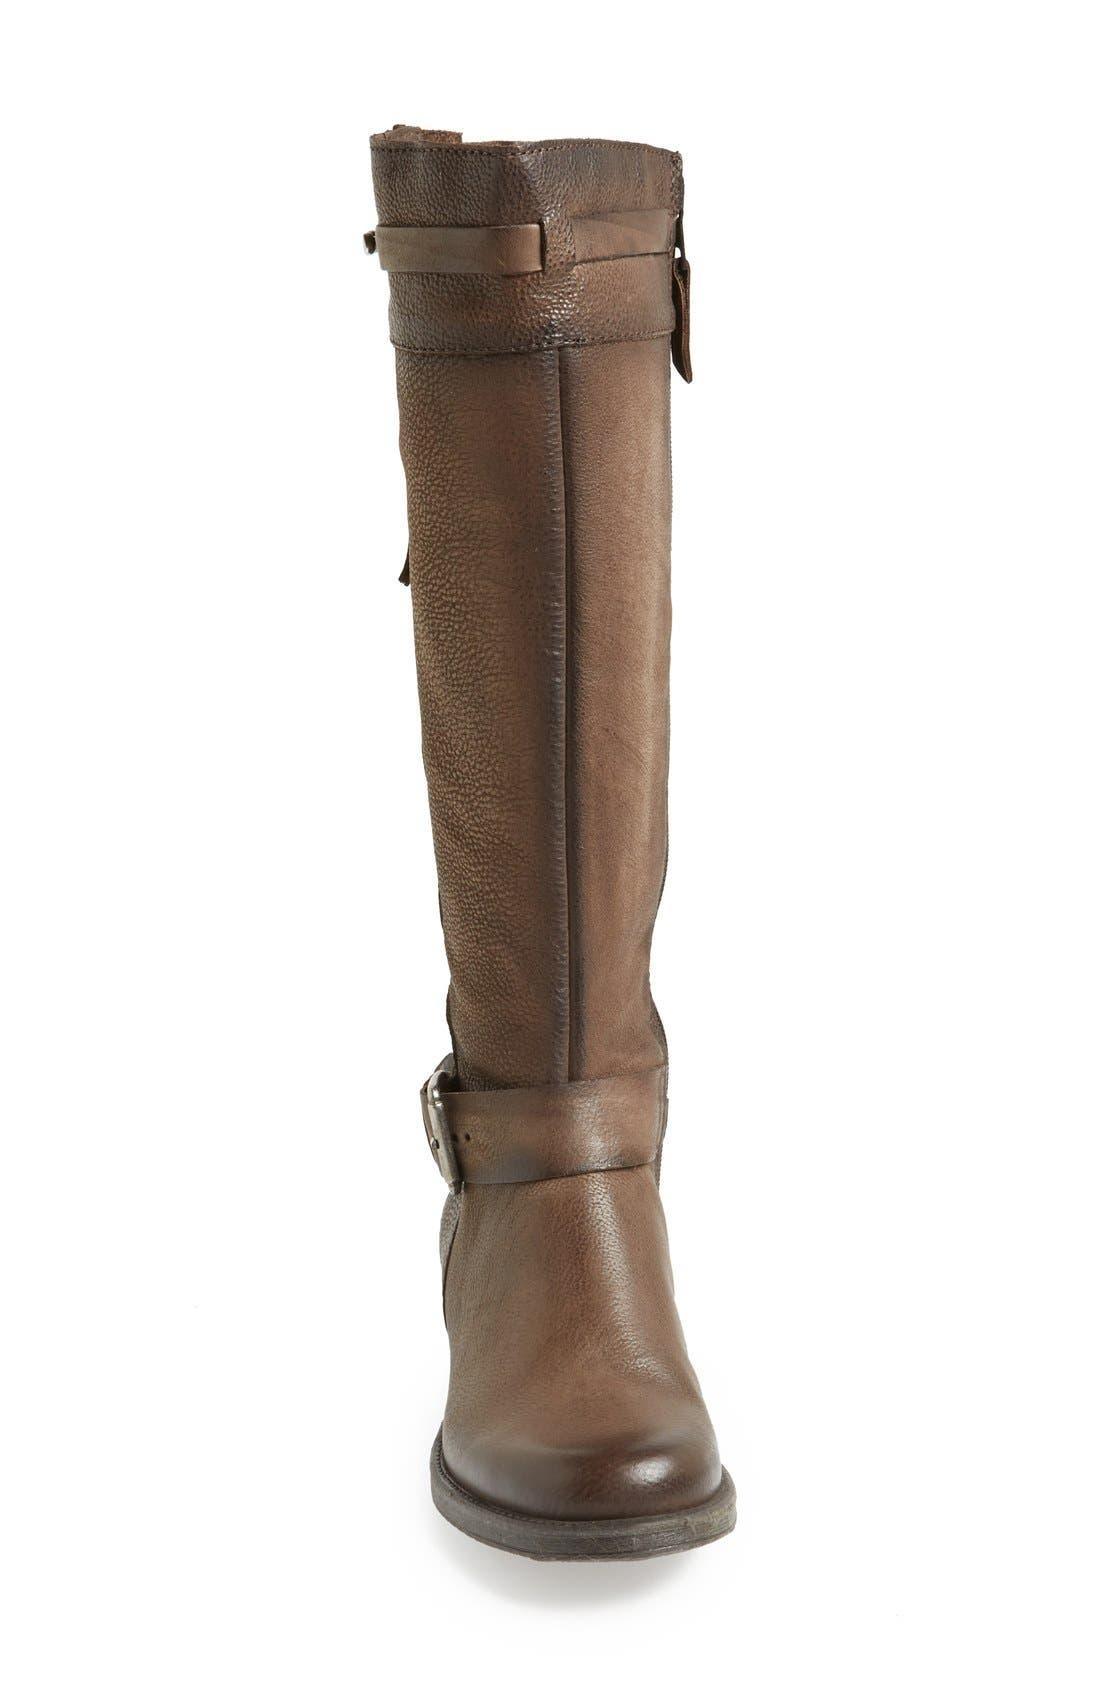 Alternate Image 3  - Miz Mooz 'Nicola' Riding Boot (Women)